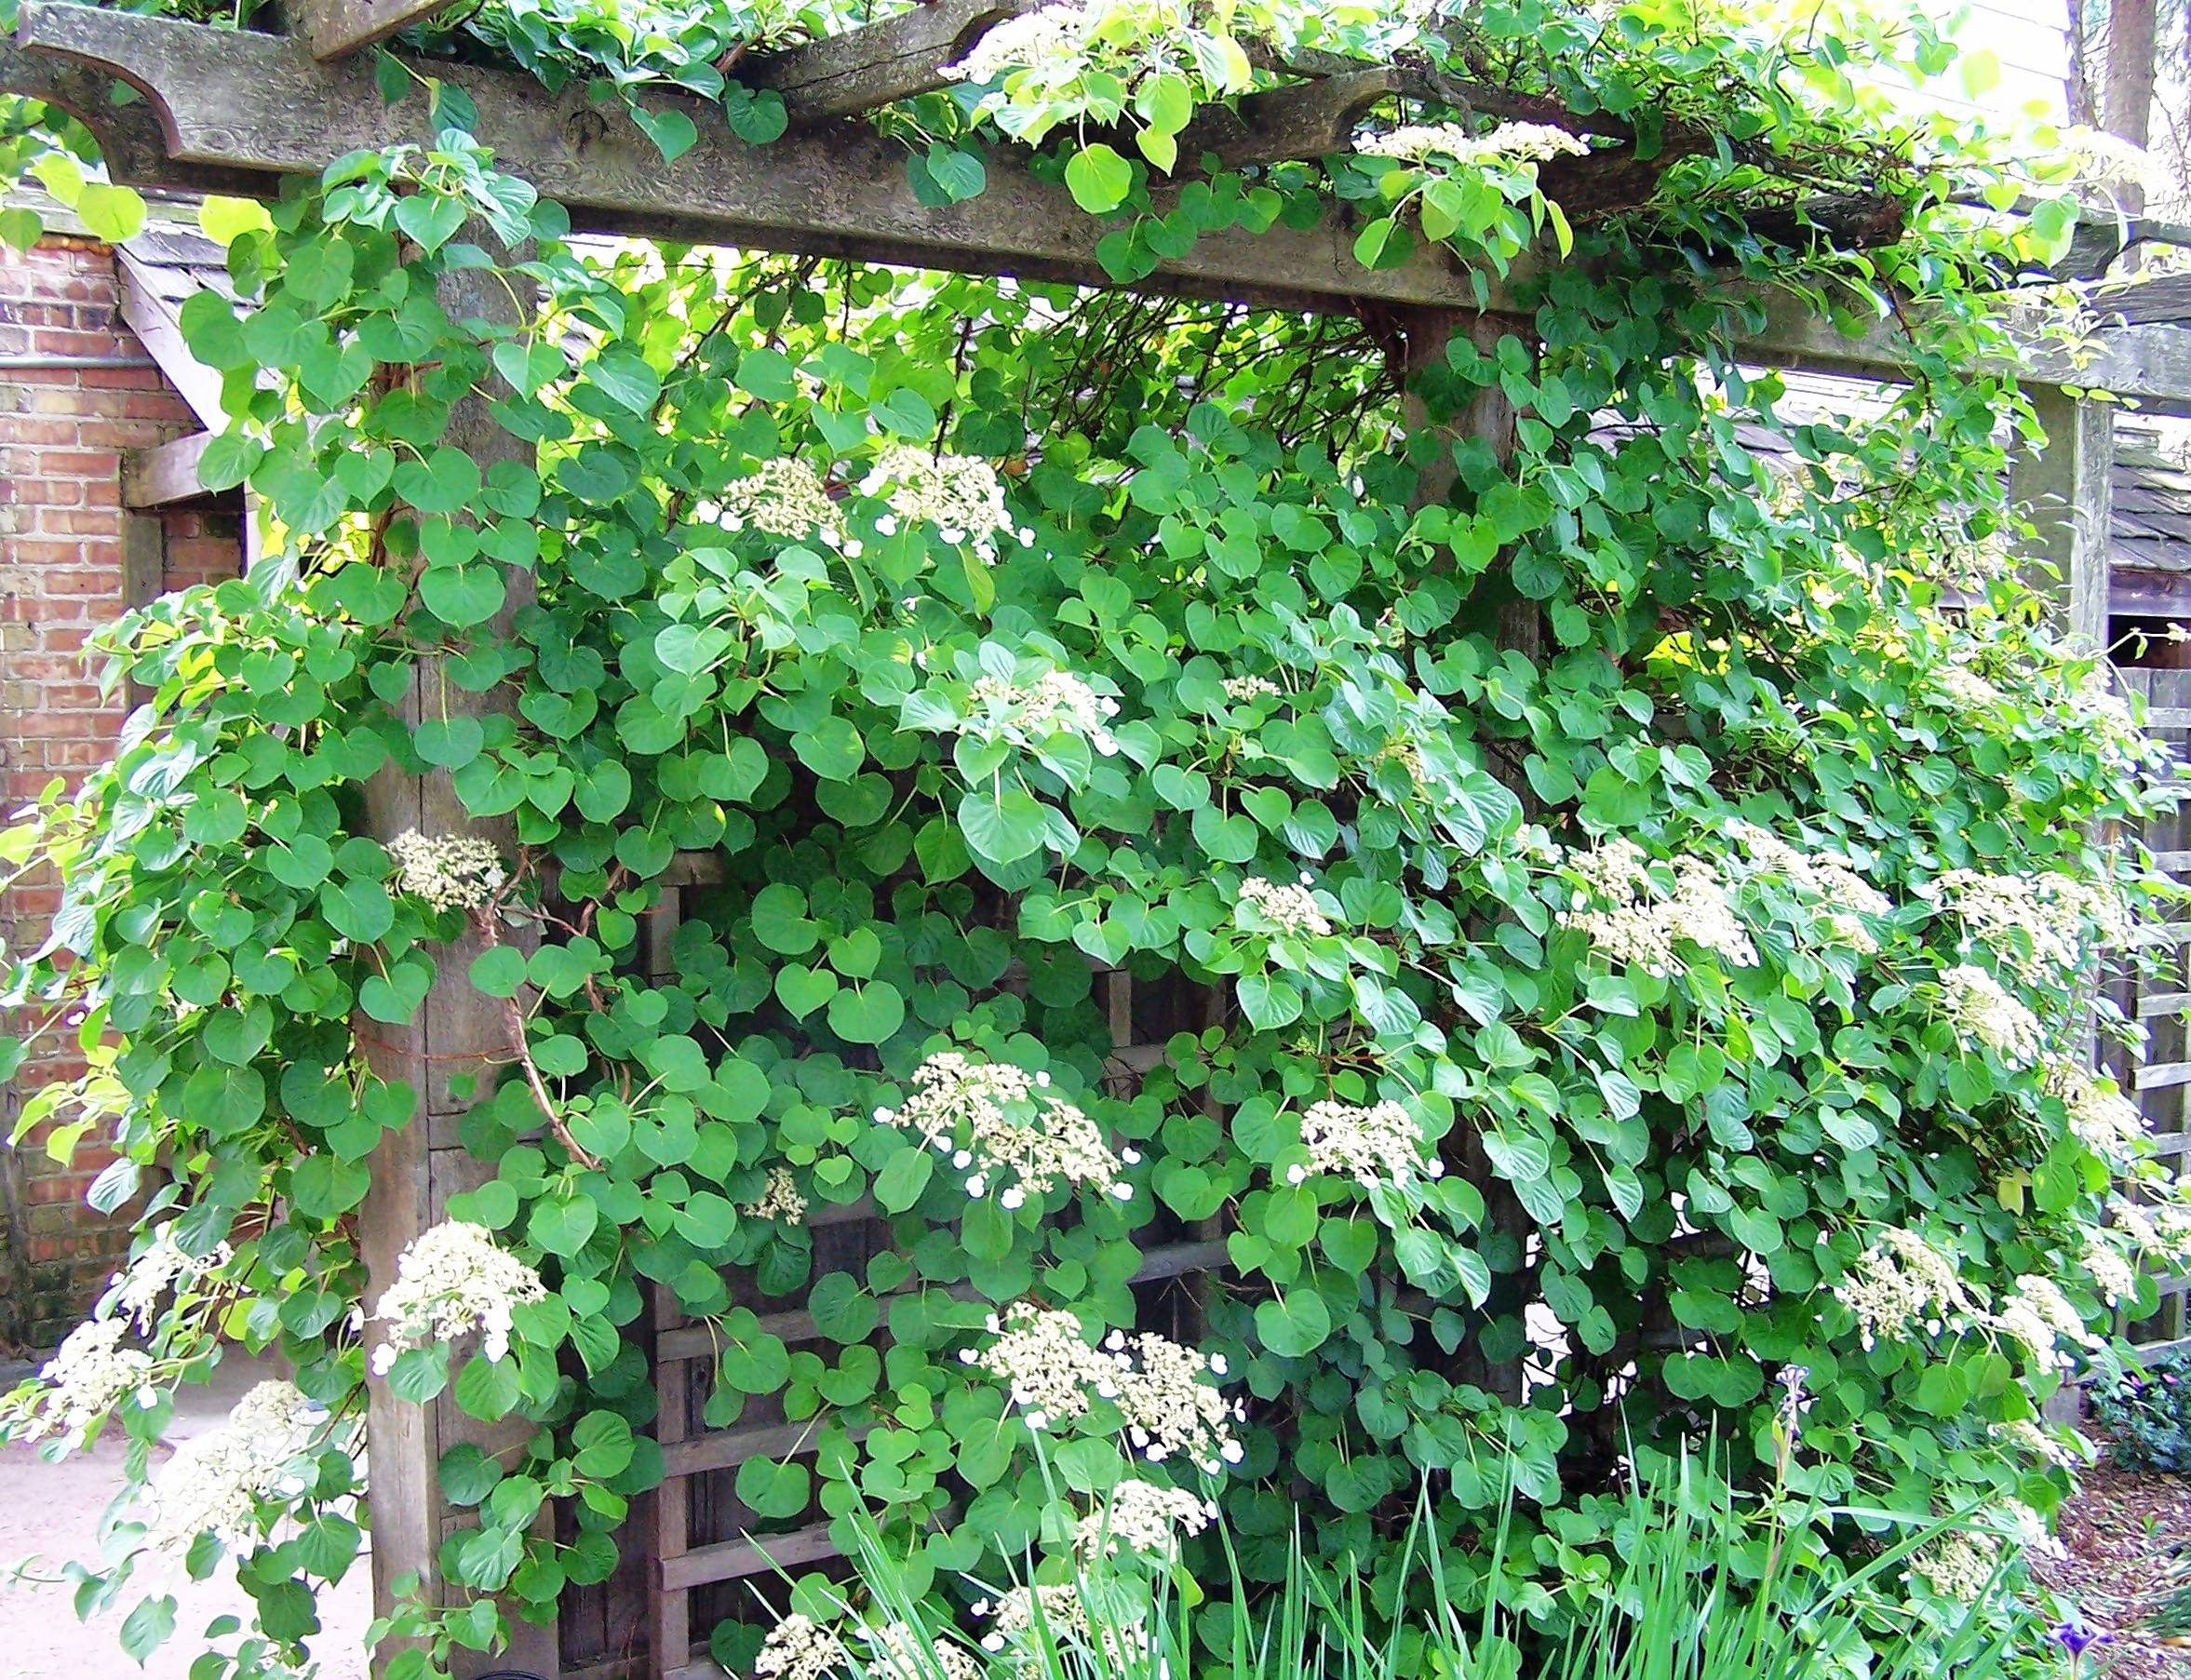 Climbing Hydrangeas Grow Across Pergolas And Fences, Clamber Up Trees,  Sprawl Over Stone Walls